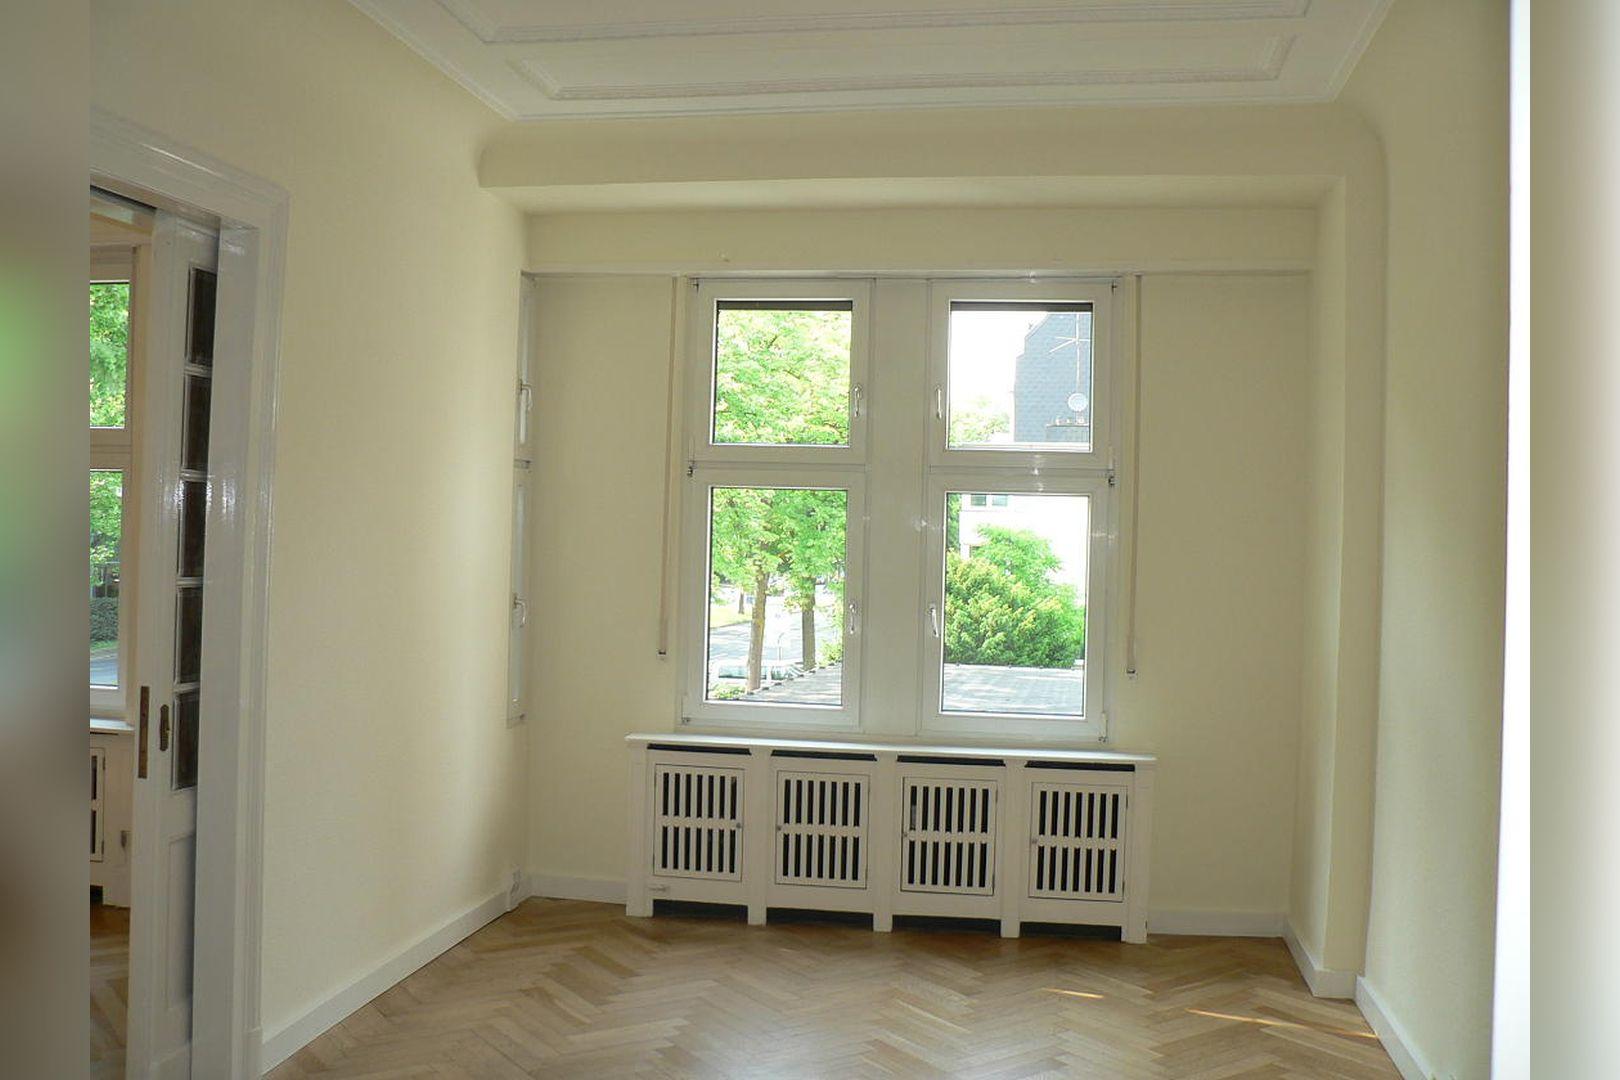 Immobilie Nr.114 - Bürofläche im Altbauobjekt - Bild 9.jpg